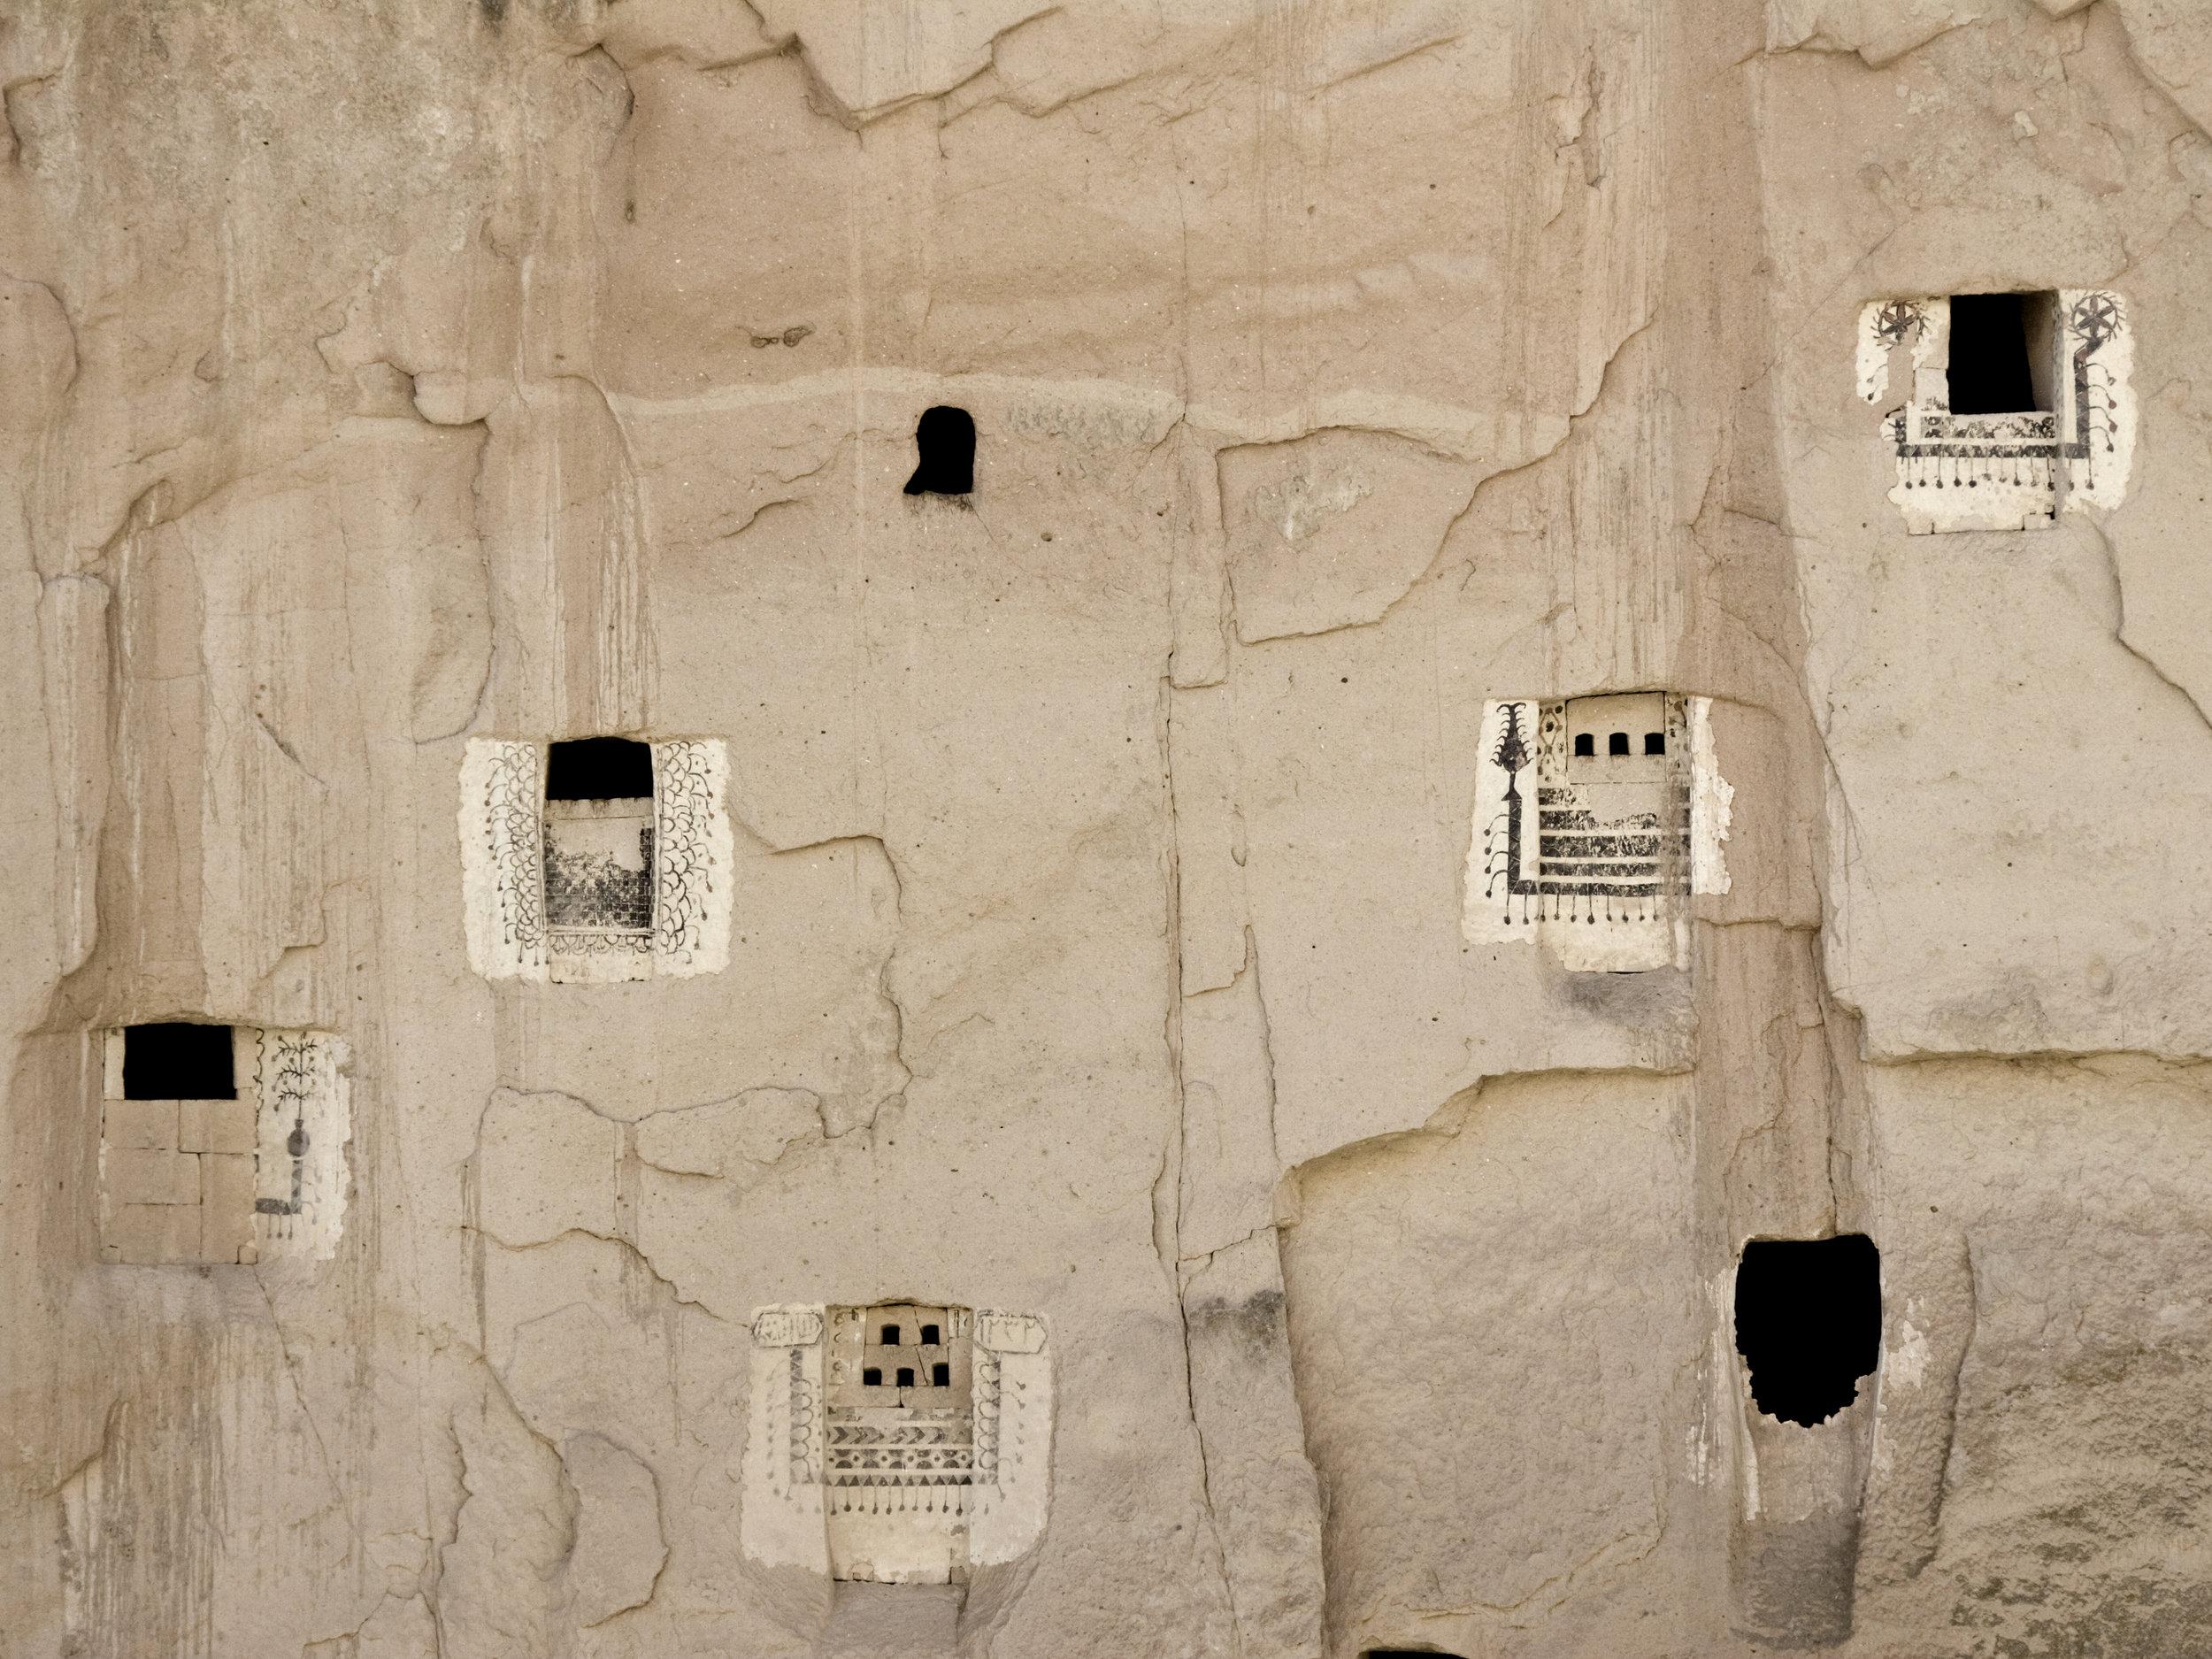 cappadocia132.jpg